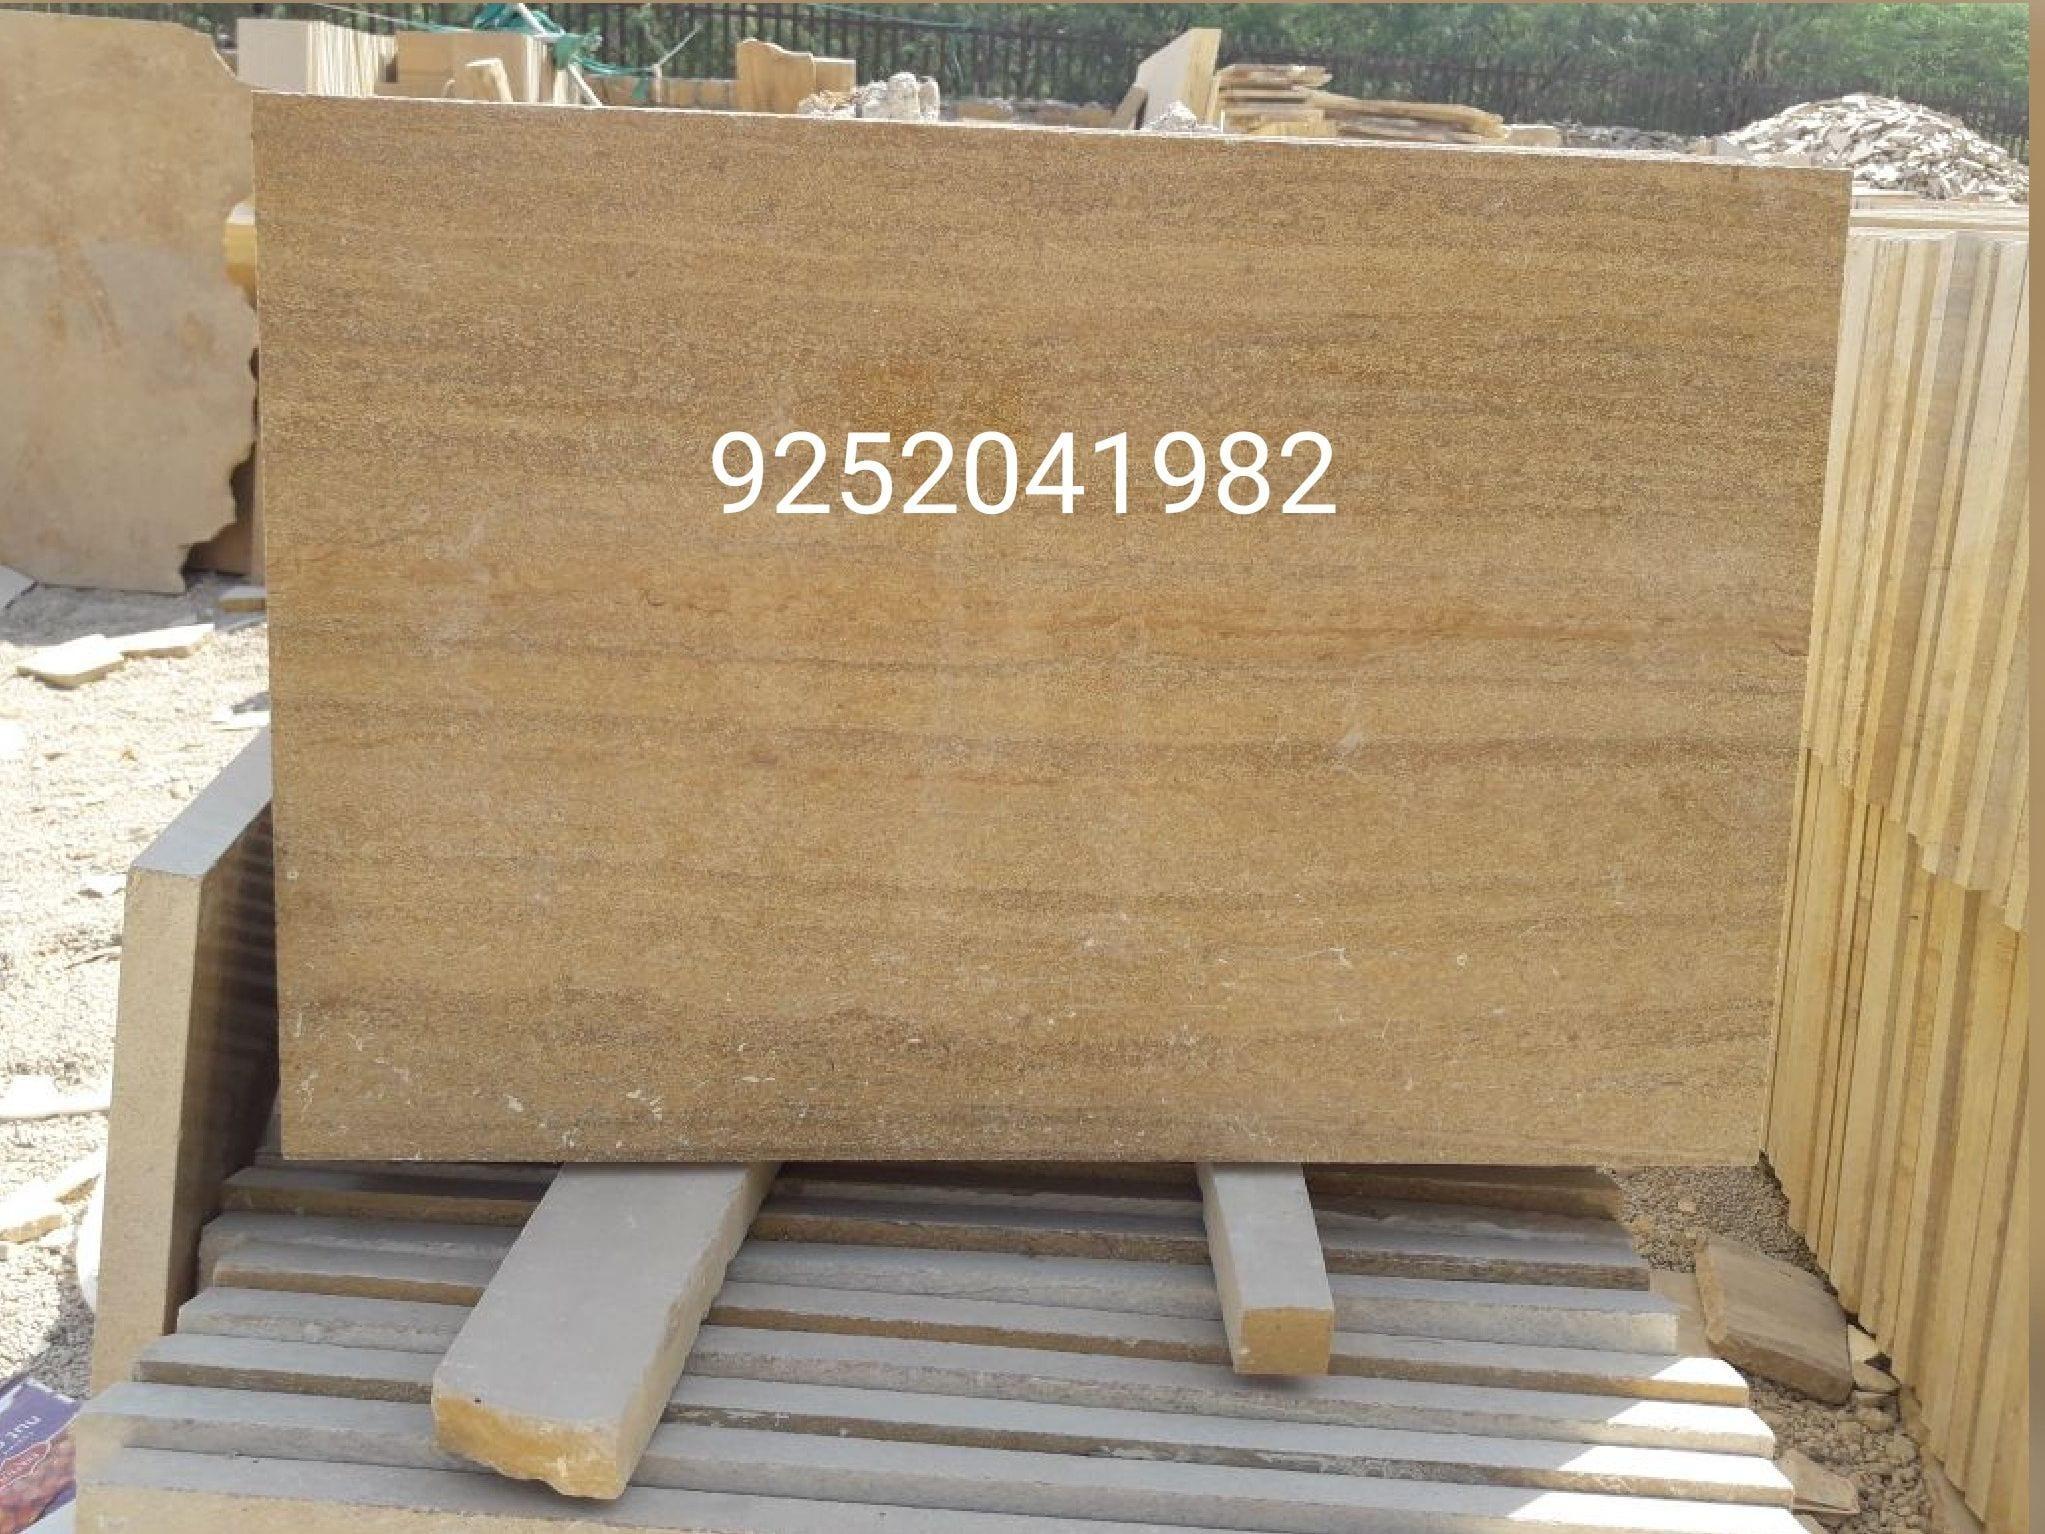 jaisalmer stone price banglore